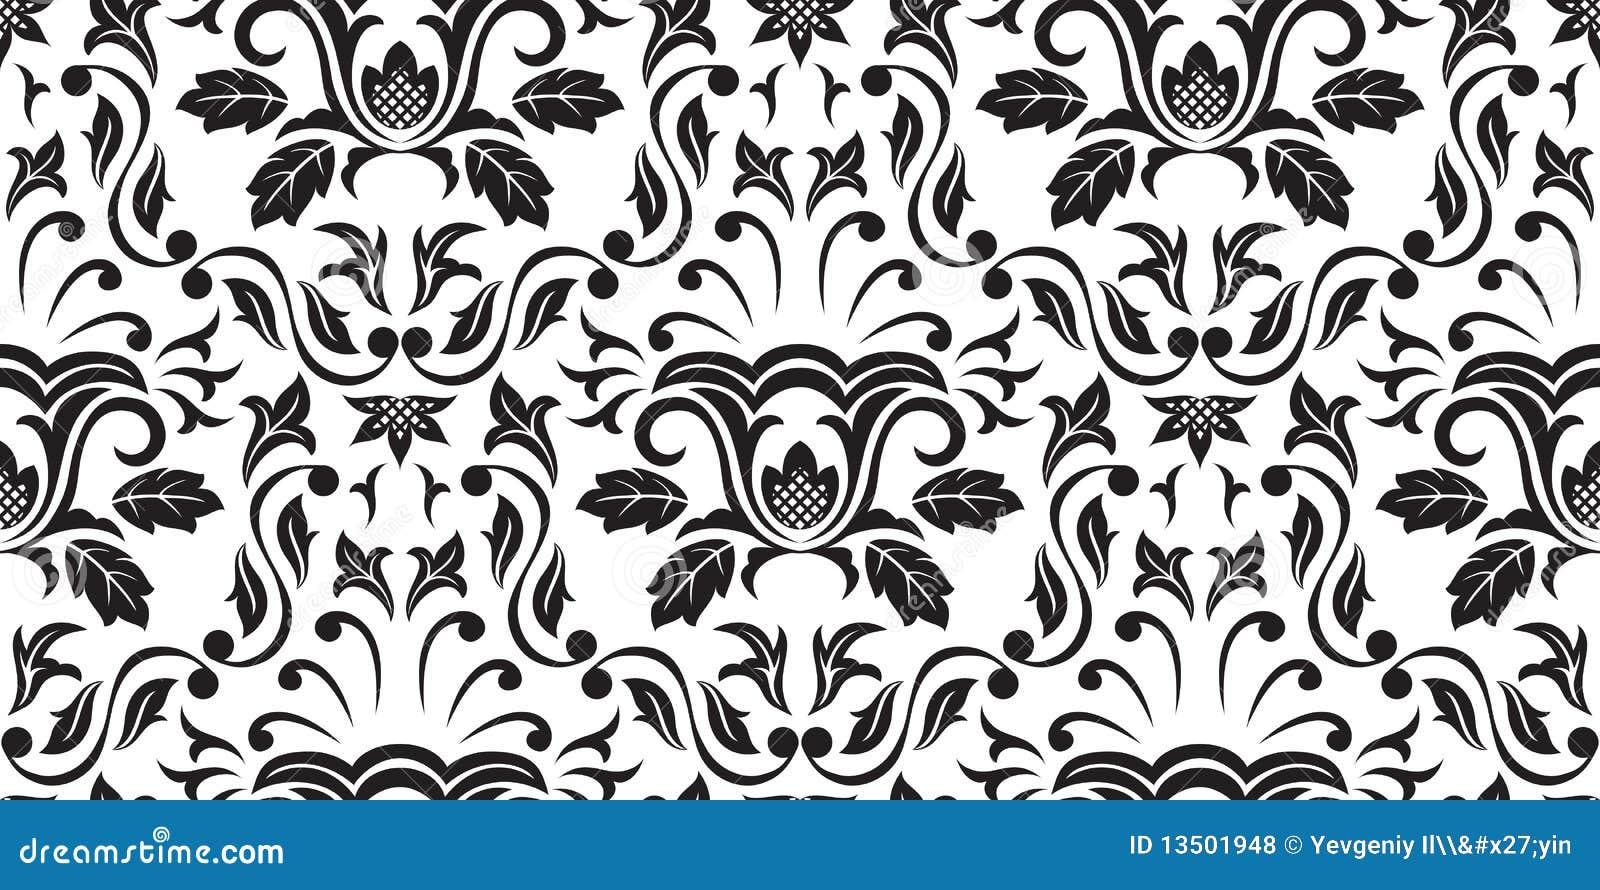 Papel de parede sem emenda preto fotos de stock royalty - Papel decorativos para paredes ...